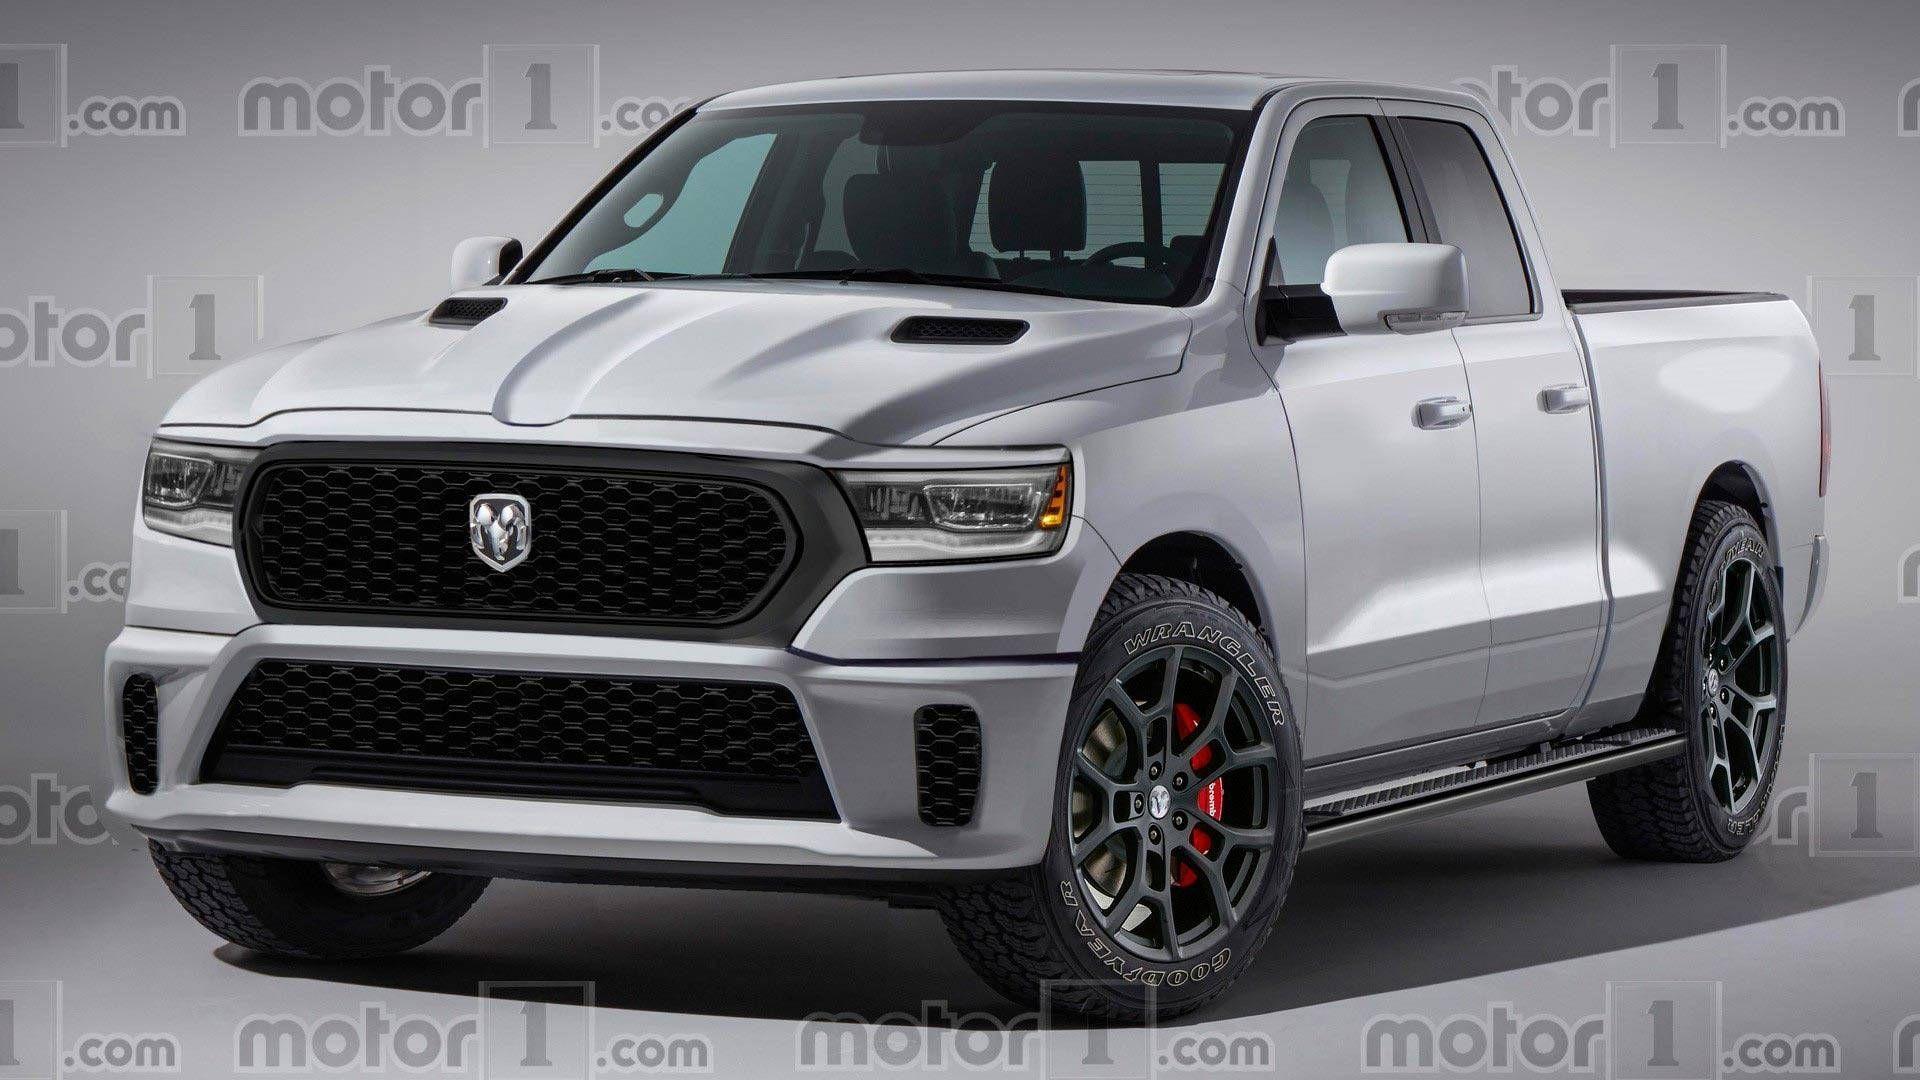 Top 2019 Dodge Ram Hellcat Price And Review Top 2019 Dodge Ram Hellcat Price Dodge Ram Hellcat Dodge Ram Srt 10 Ram Hellcat